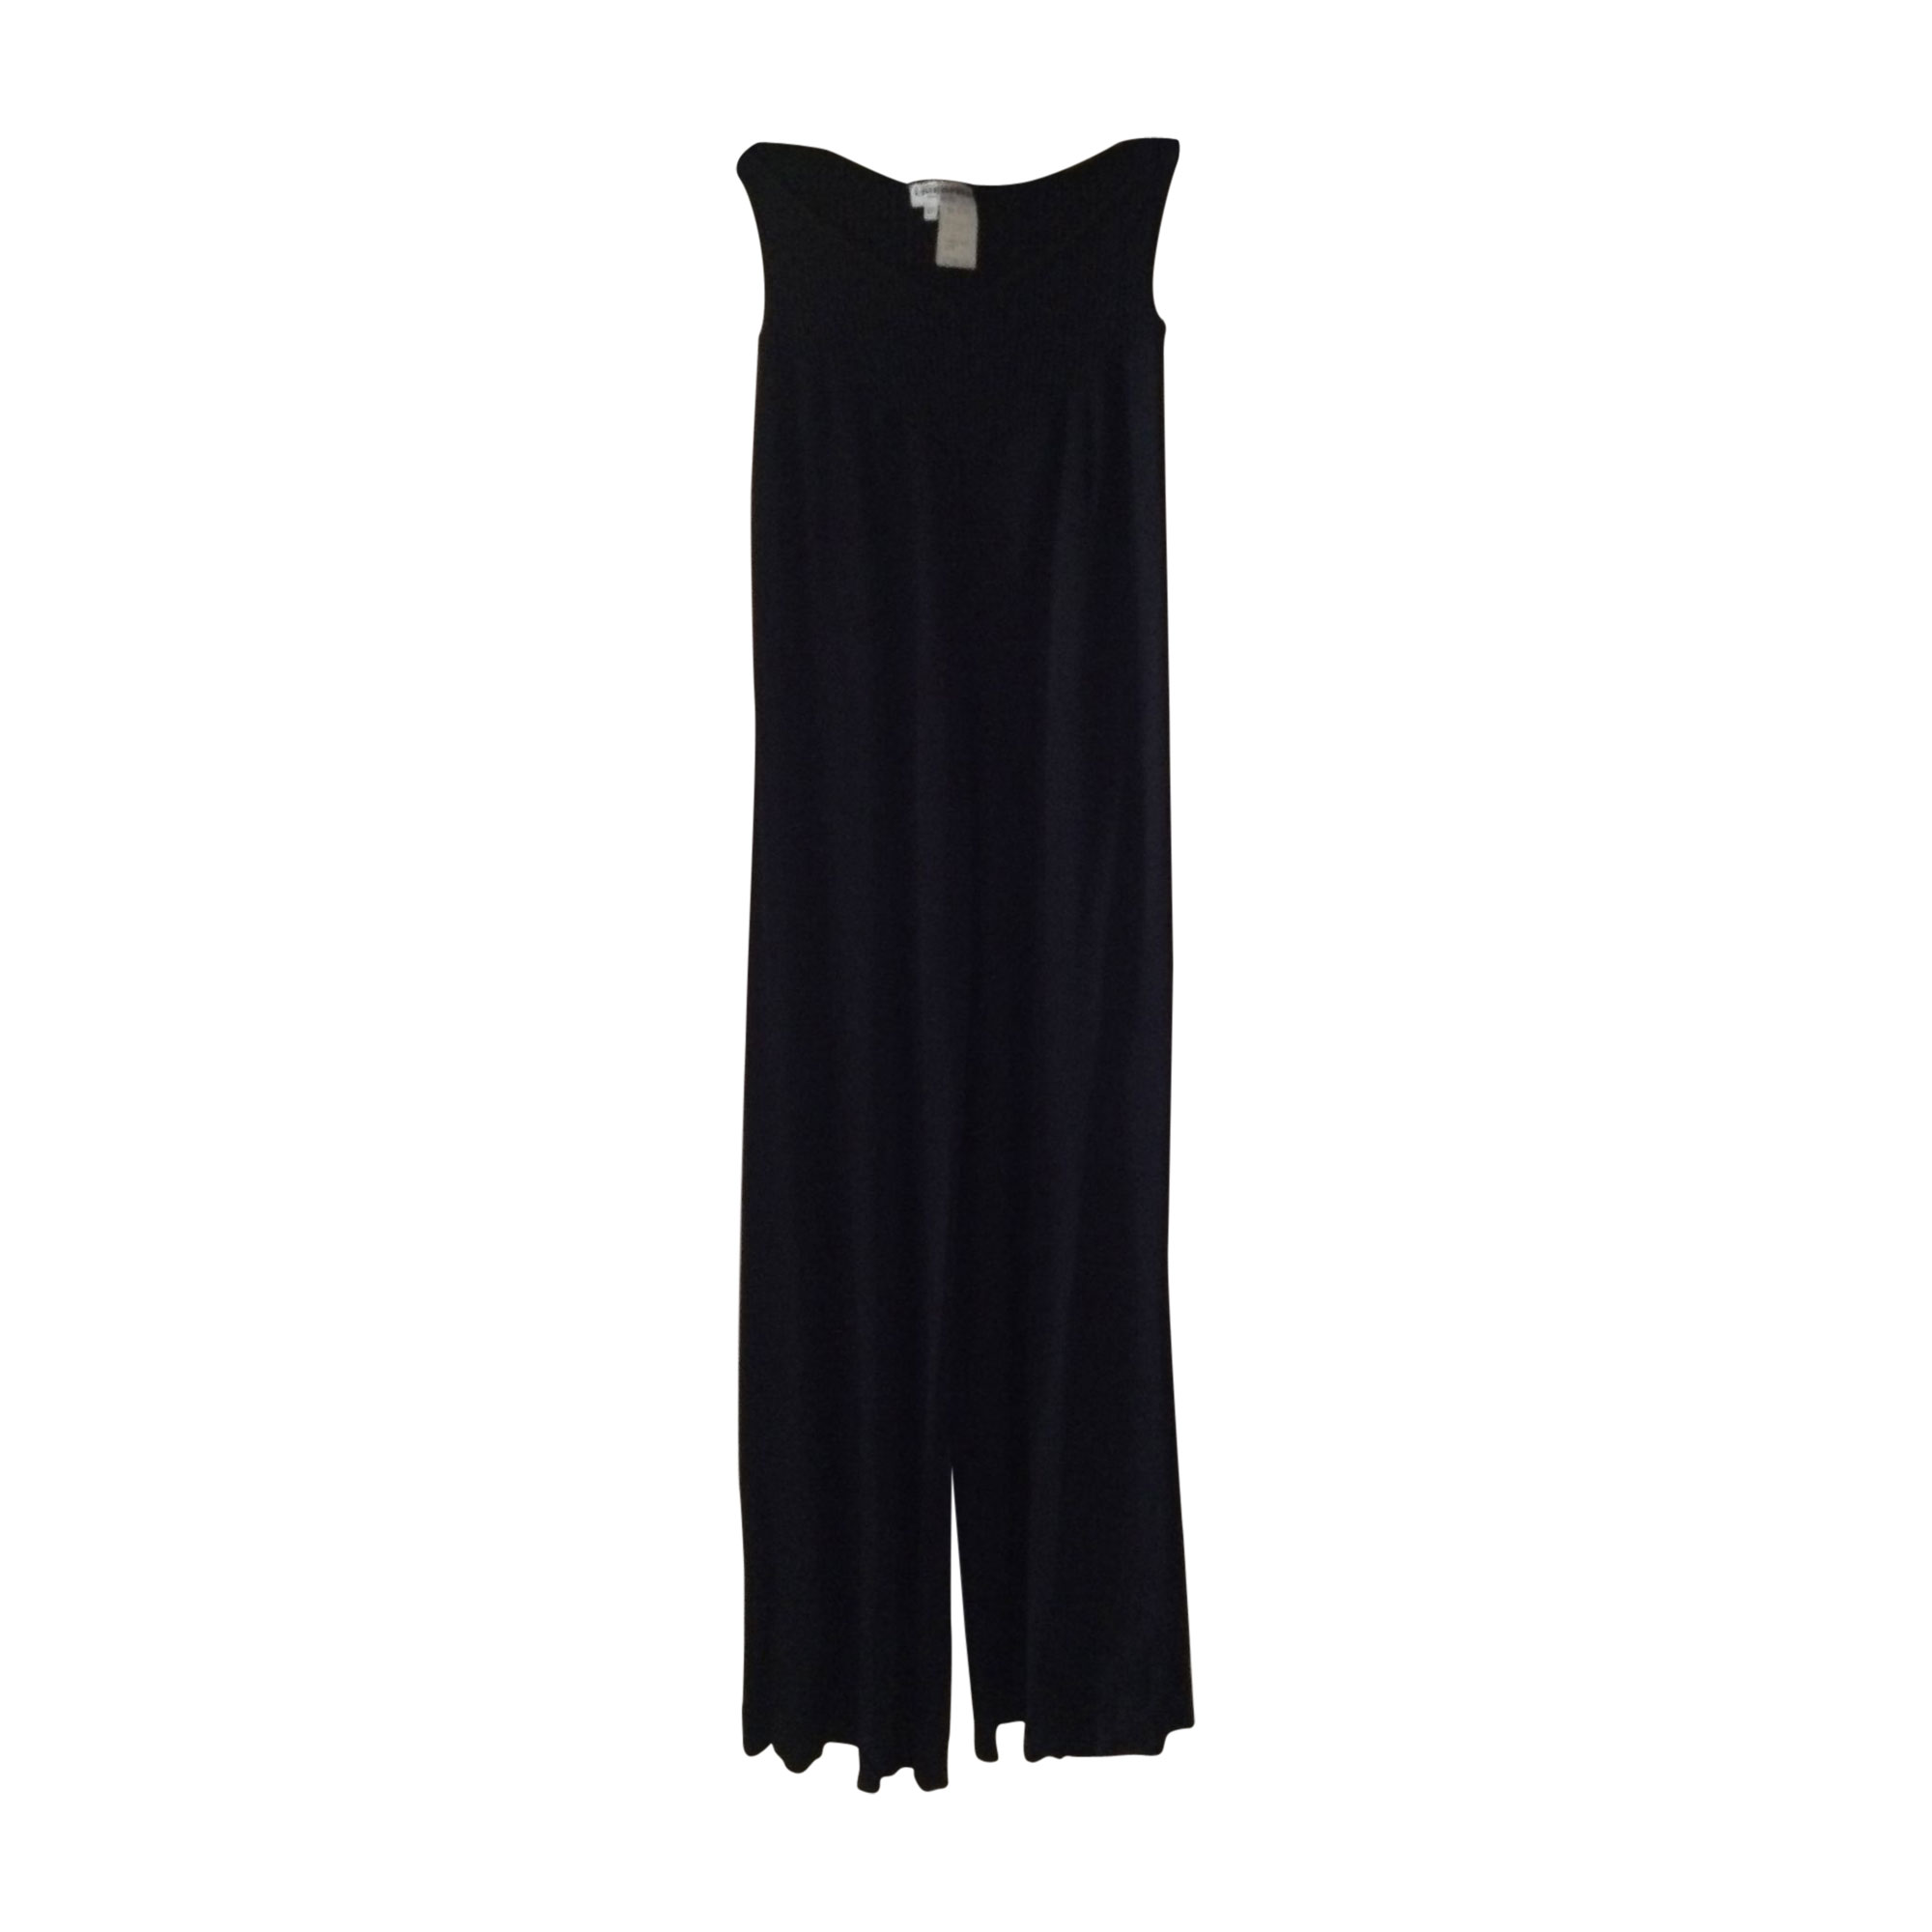 Pantalon large KARL LAGERFELD Noir